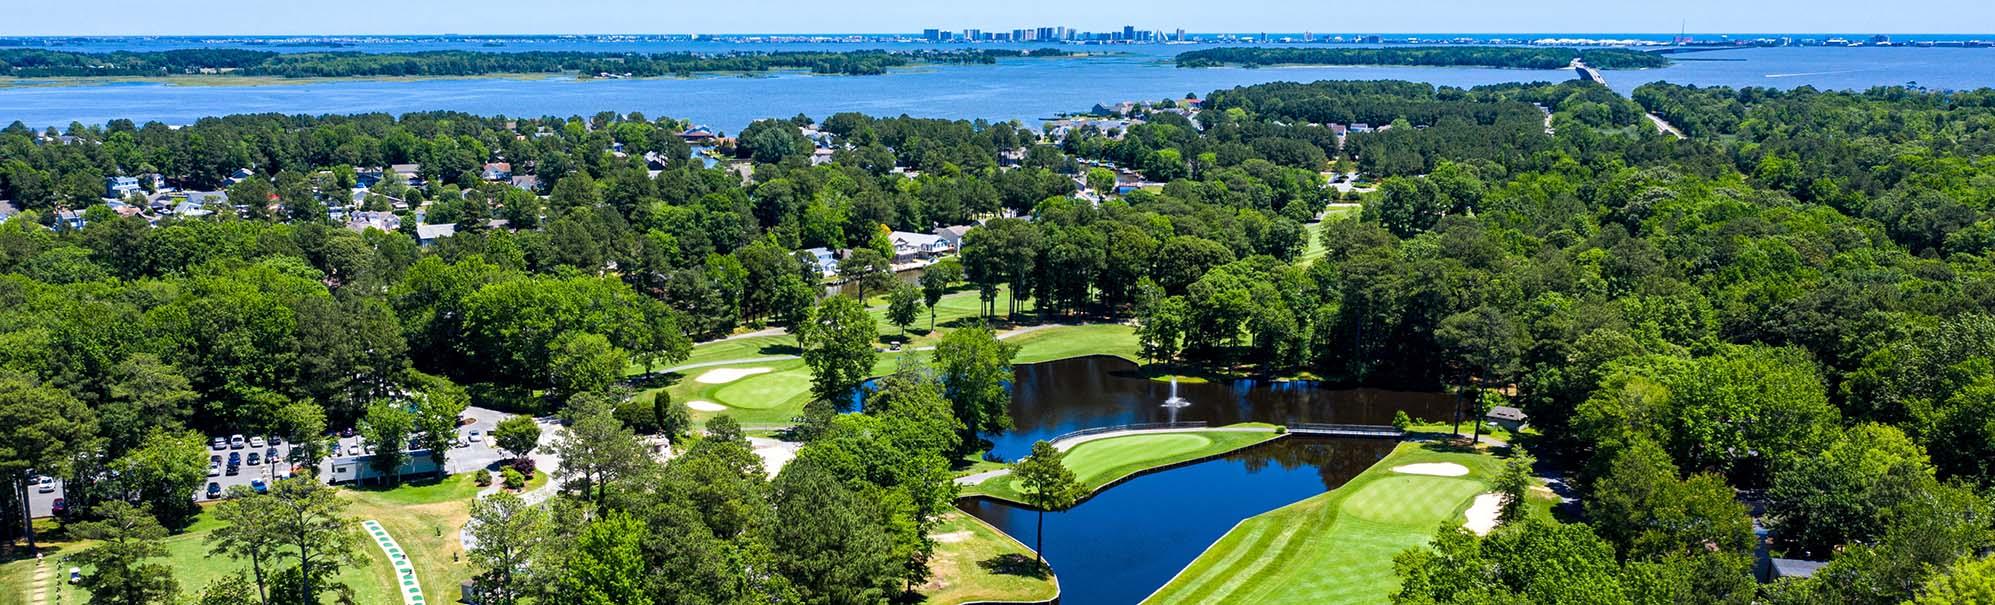 Ocean Pines Golf Course